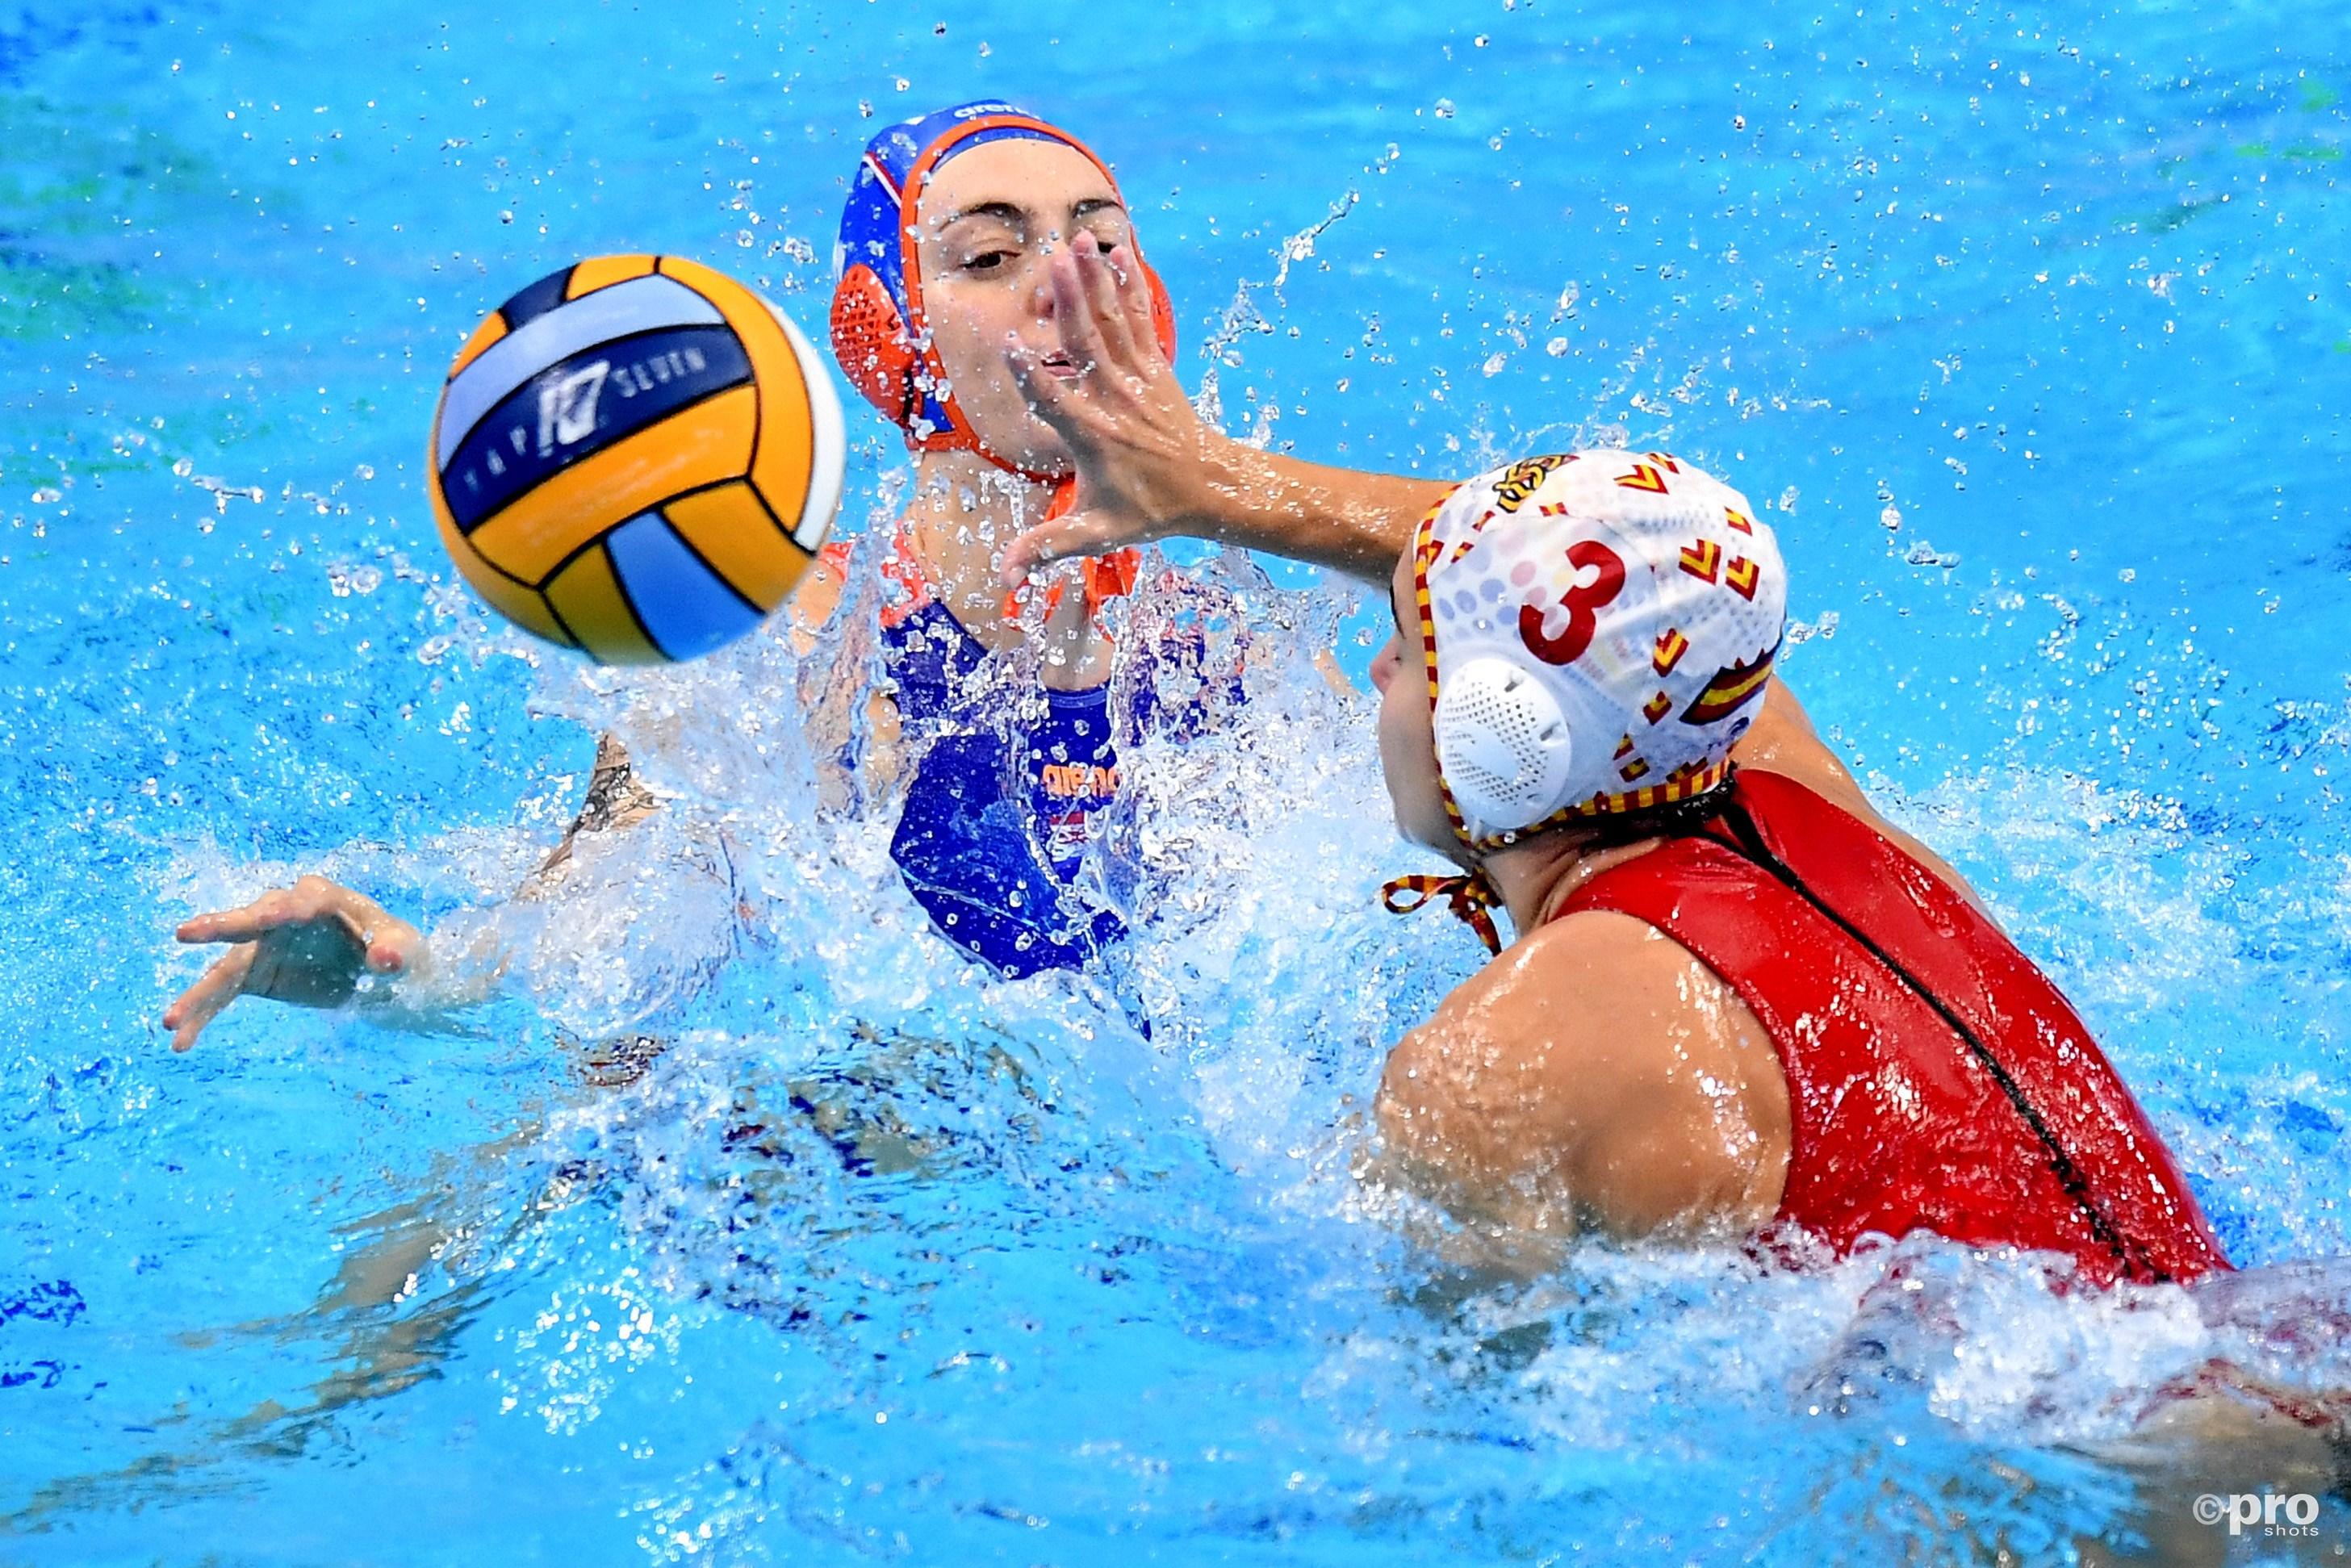 Waterpolosters na winst op Spanje als groepswinnaar naar kwartfinales EK (Pro Shots / Insidefoto)